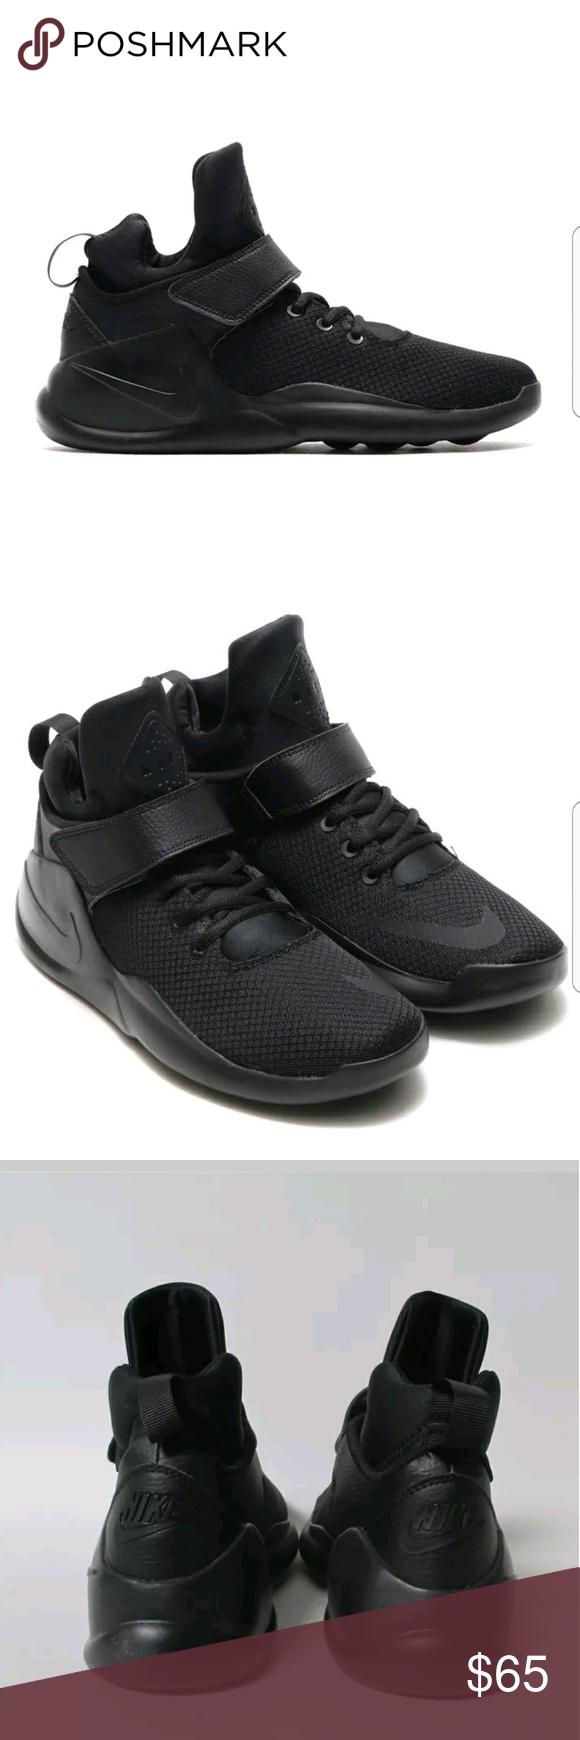 c5d432eff2af ... cheapest nike kwazi solid triple black 844839 001 new mens nike kwazi  sneakers trainers triple black